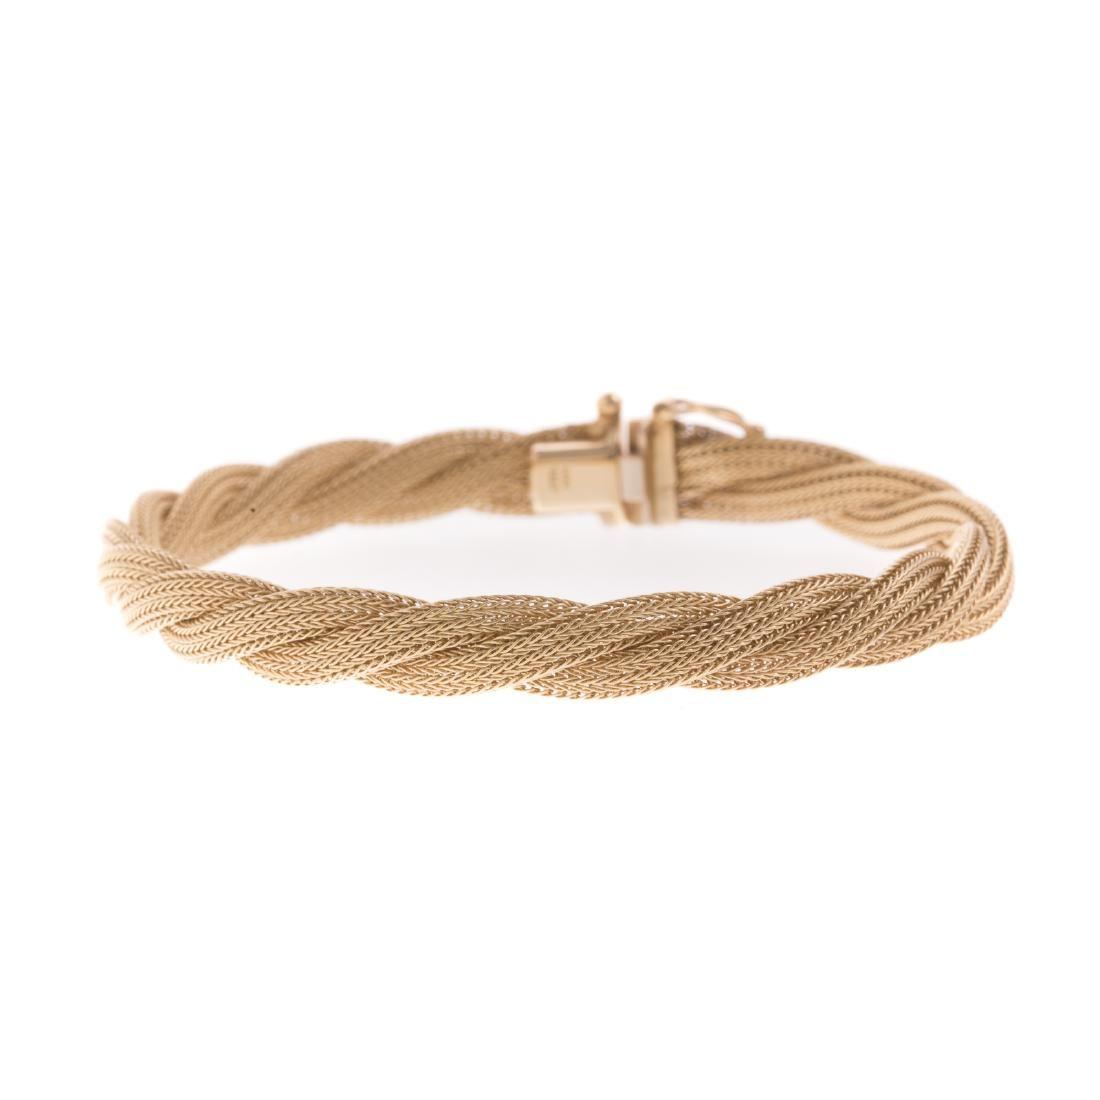 A Ladies 14K Twisted Woven Bracelet